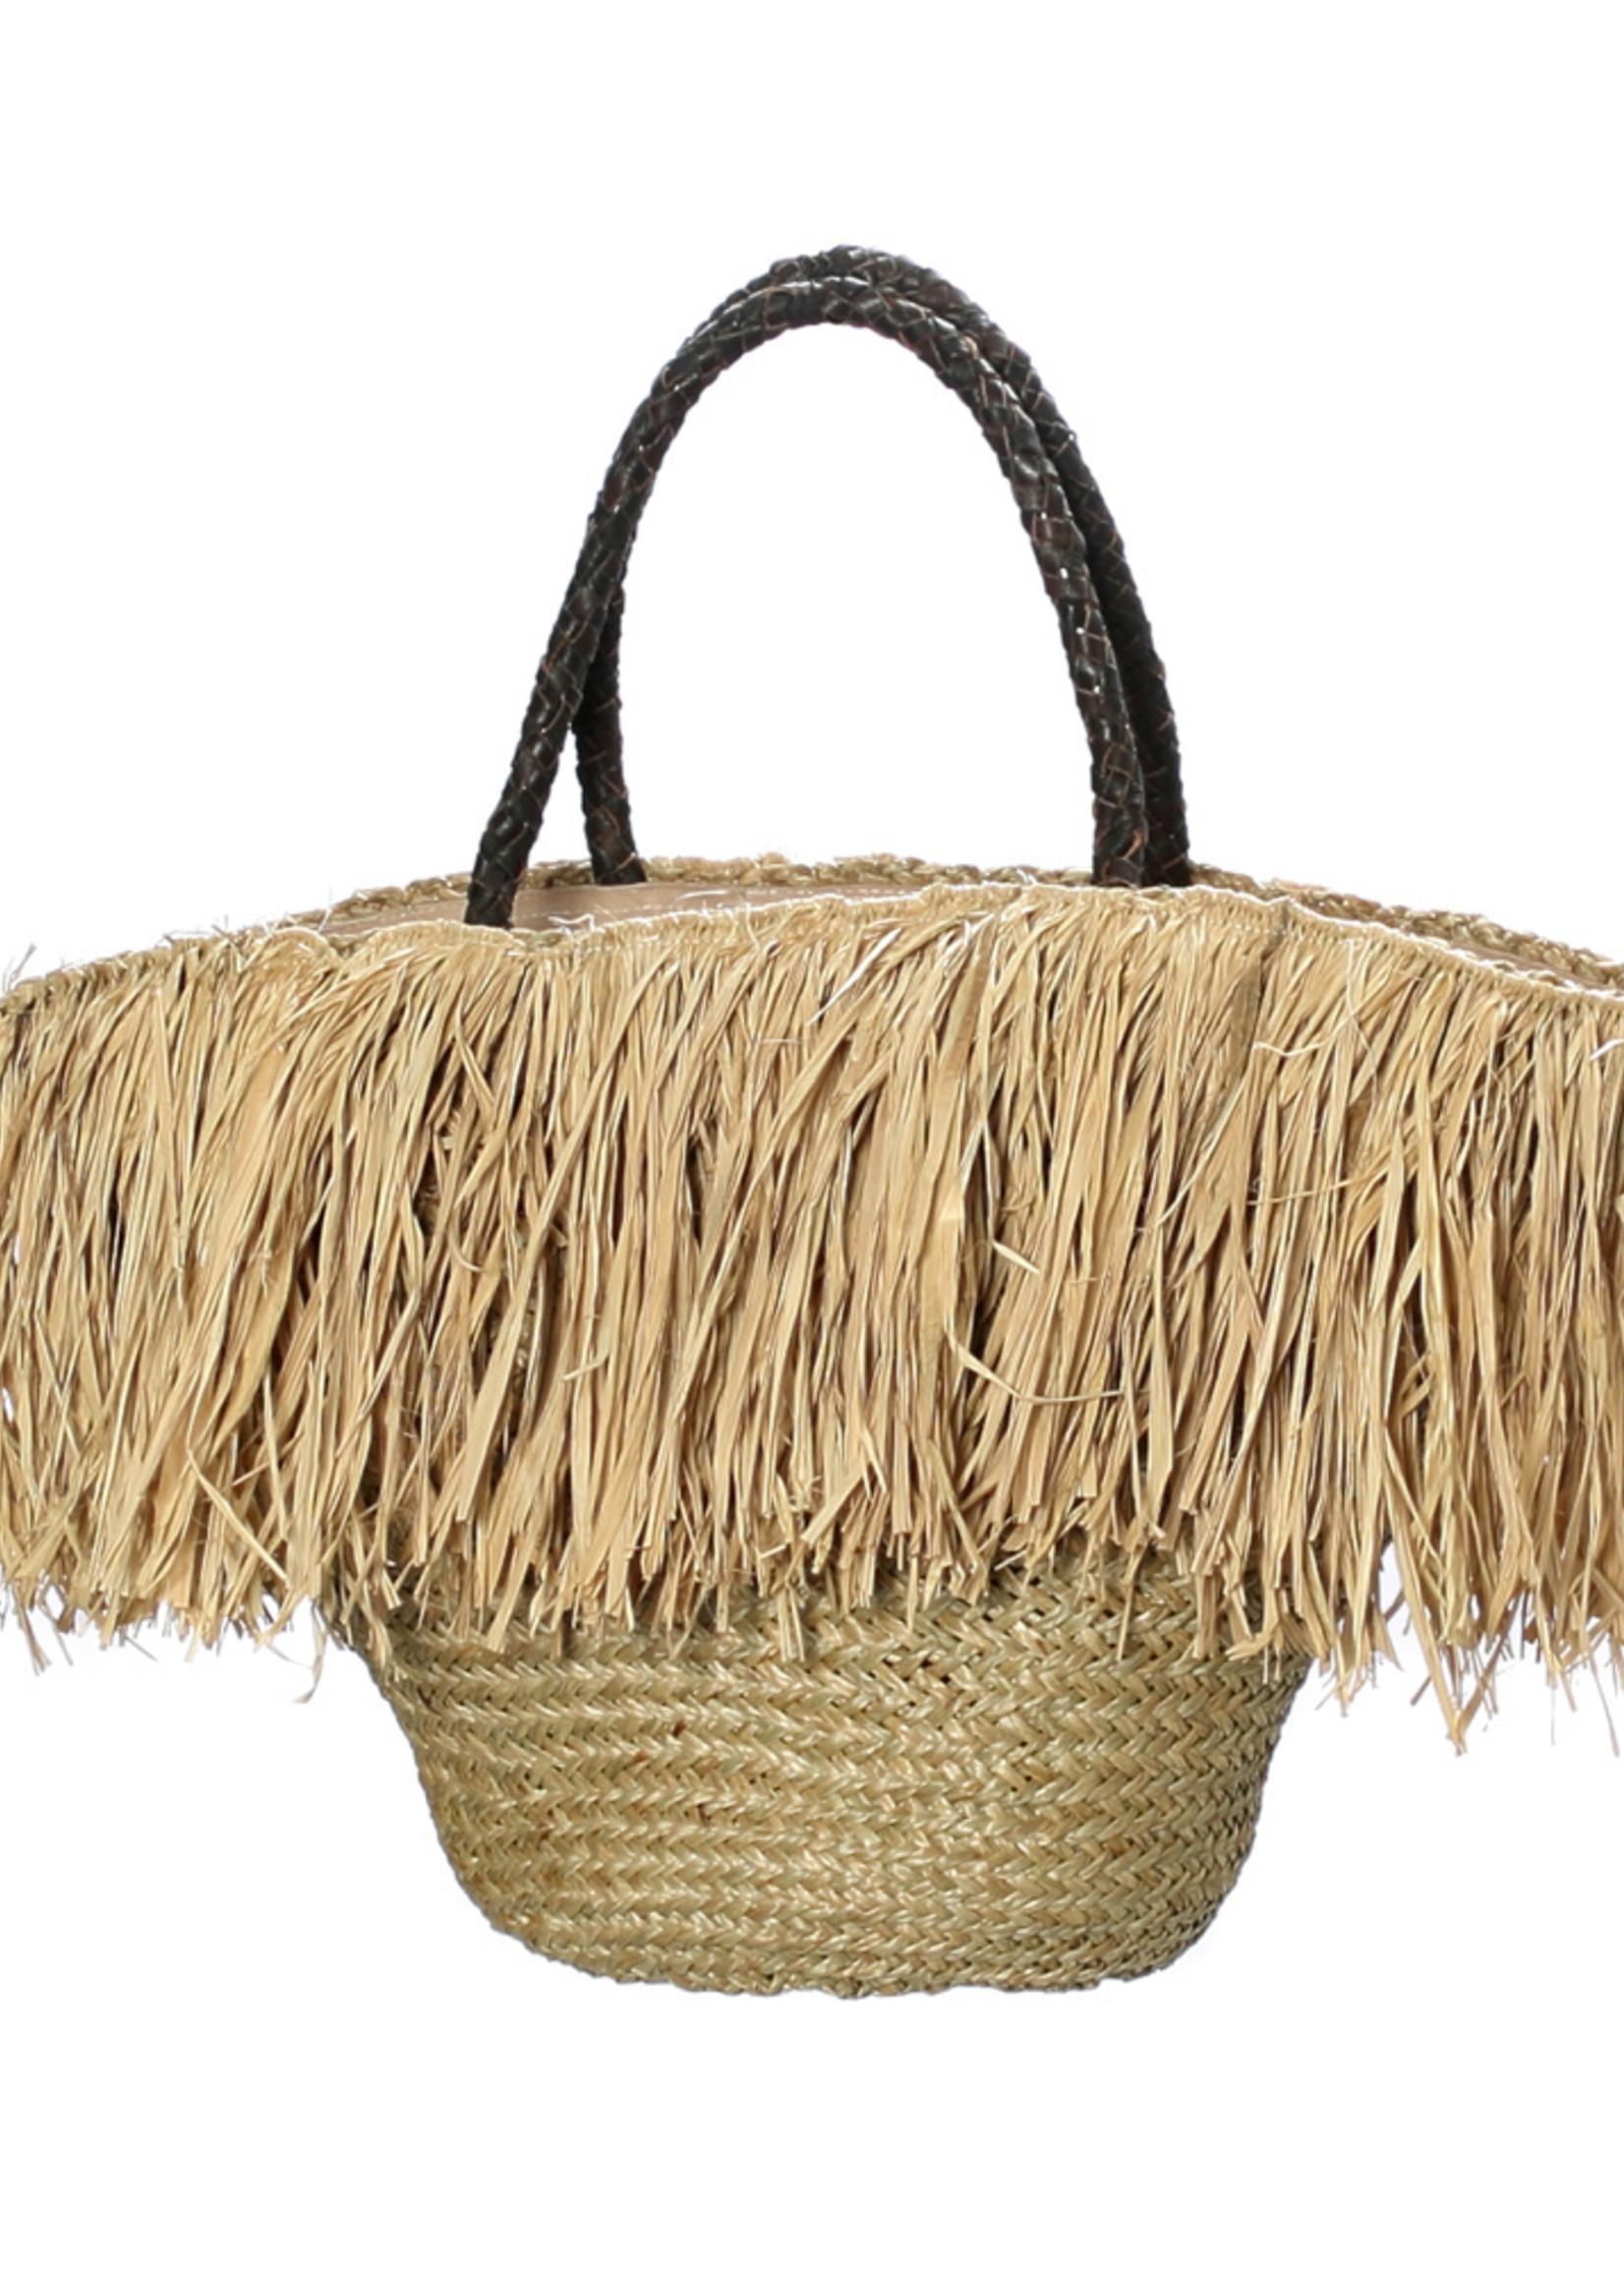 The Fringe Raffia Basket with Leather Handle - Natural